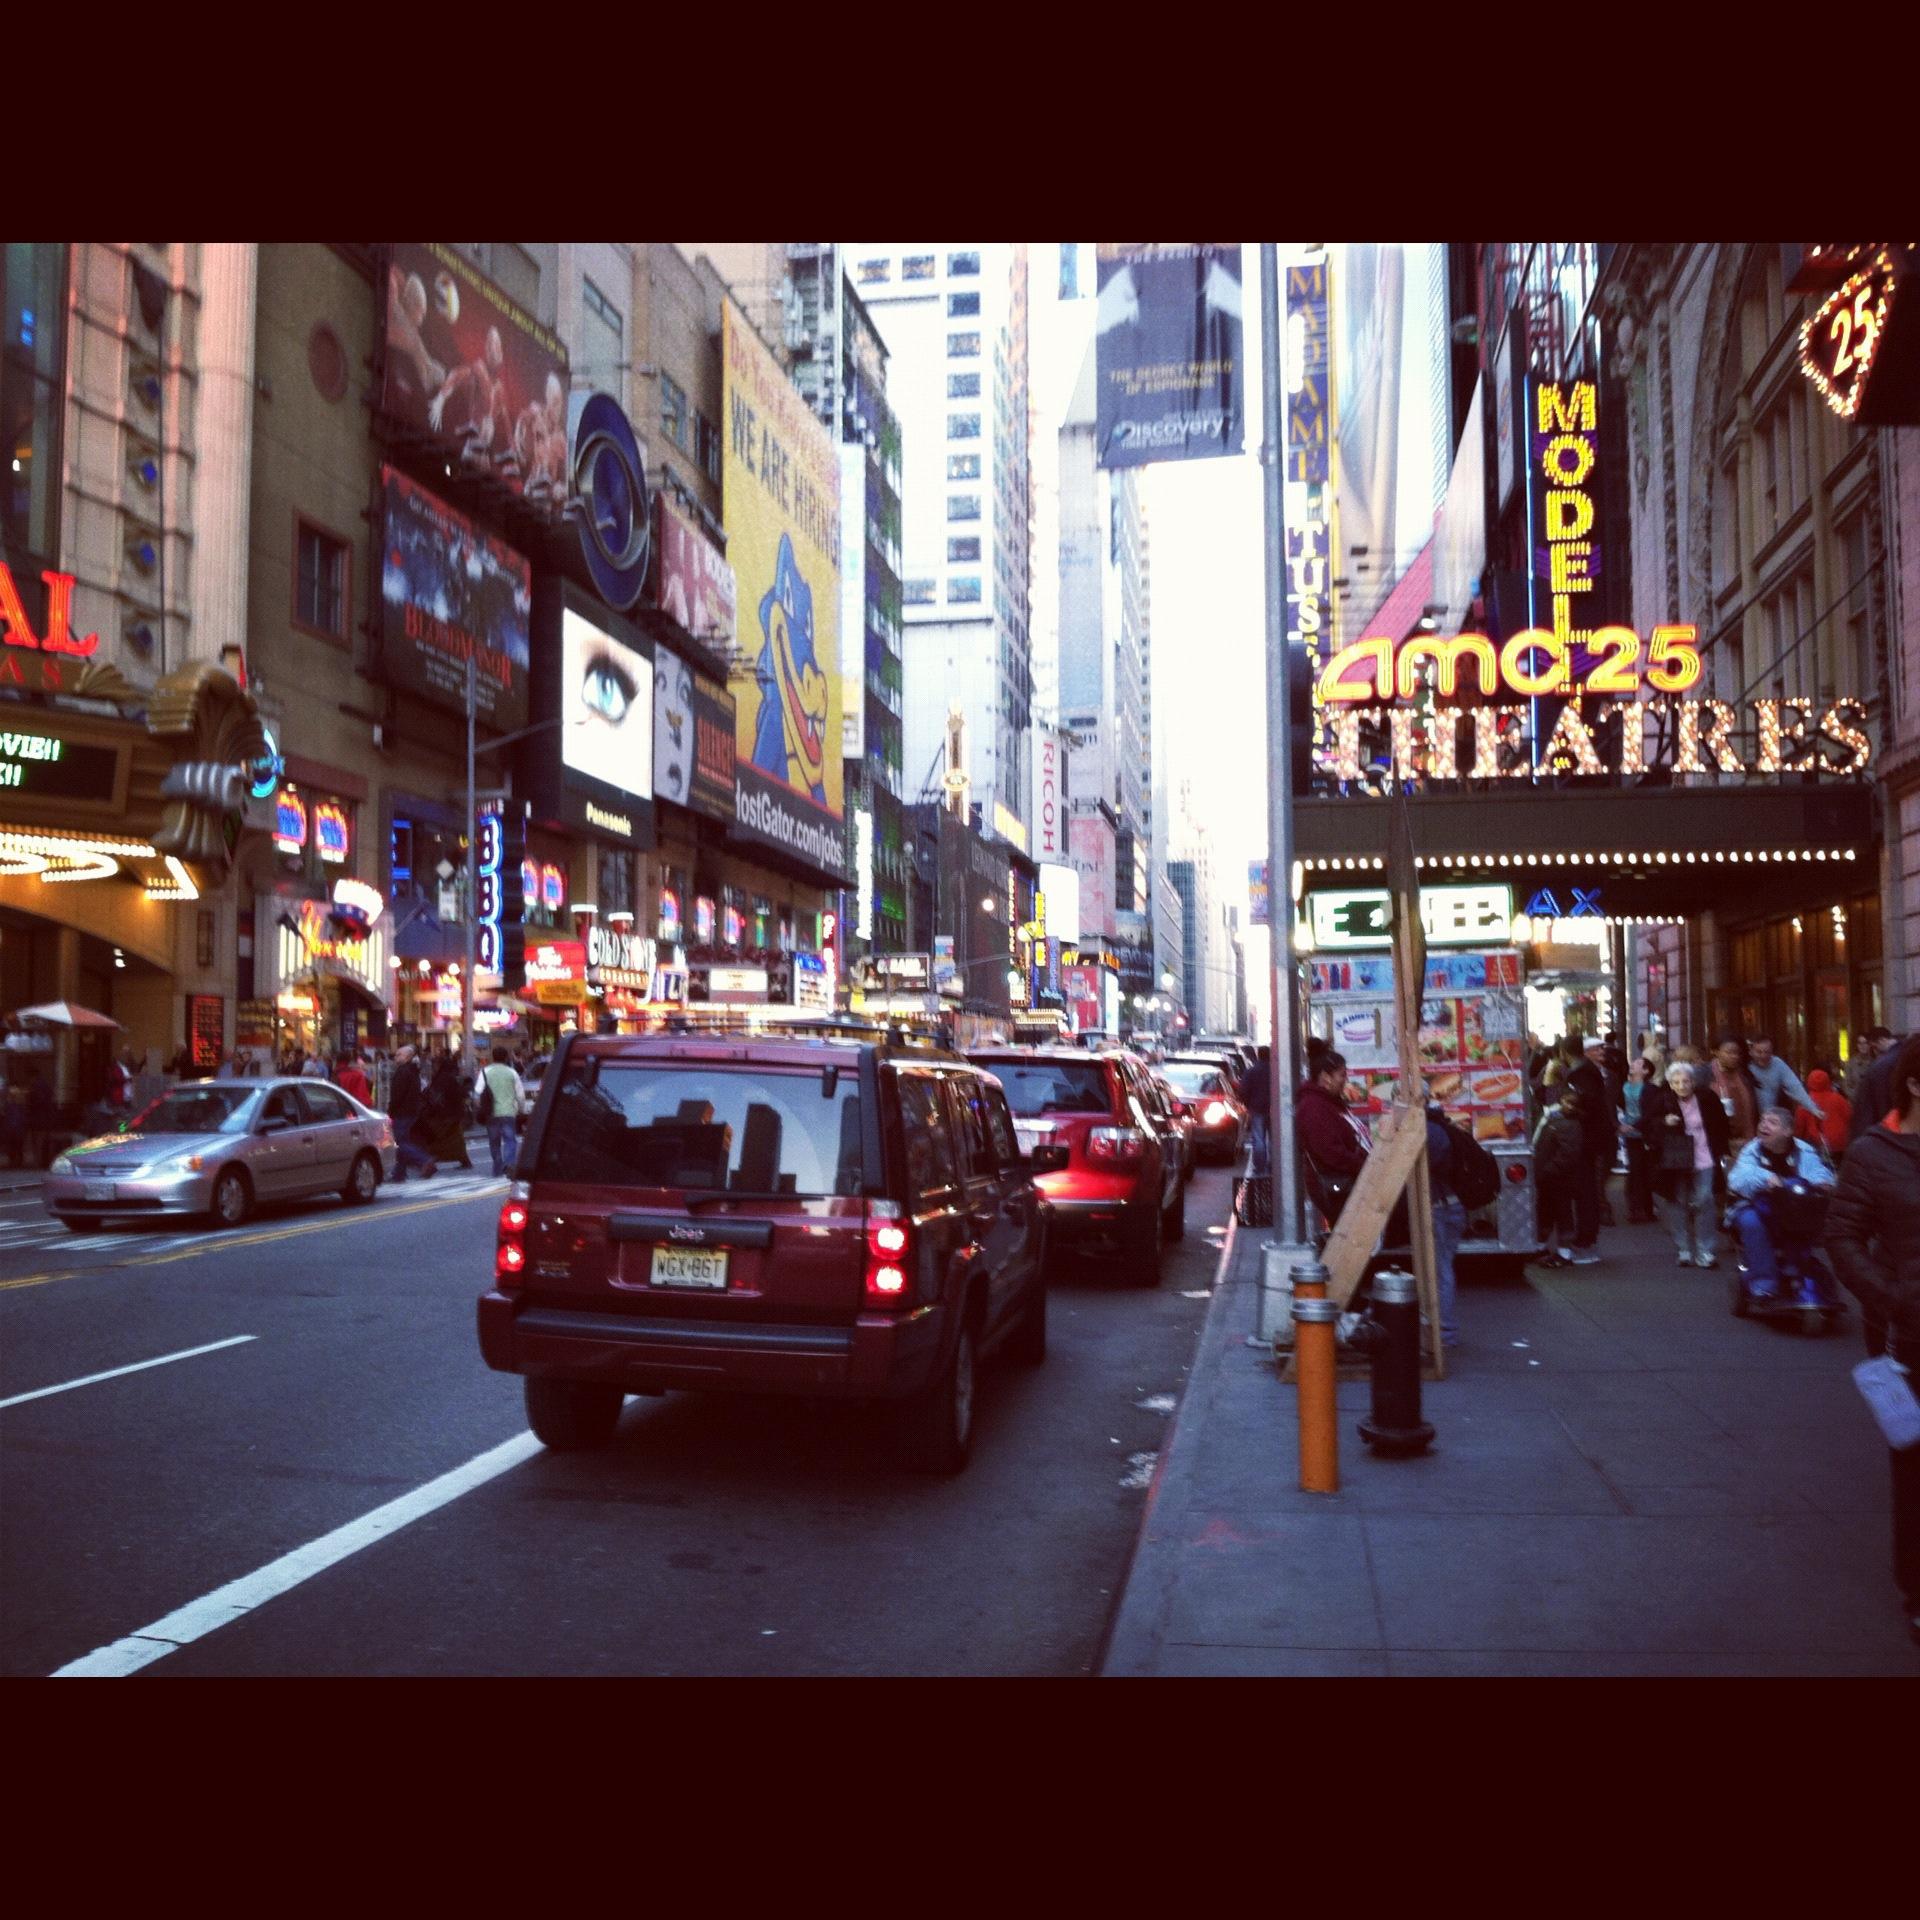 8th Avenue, A week before Sandy